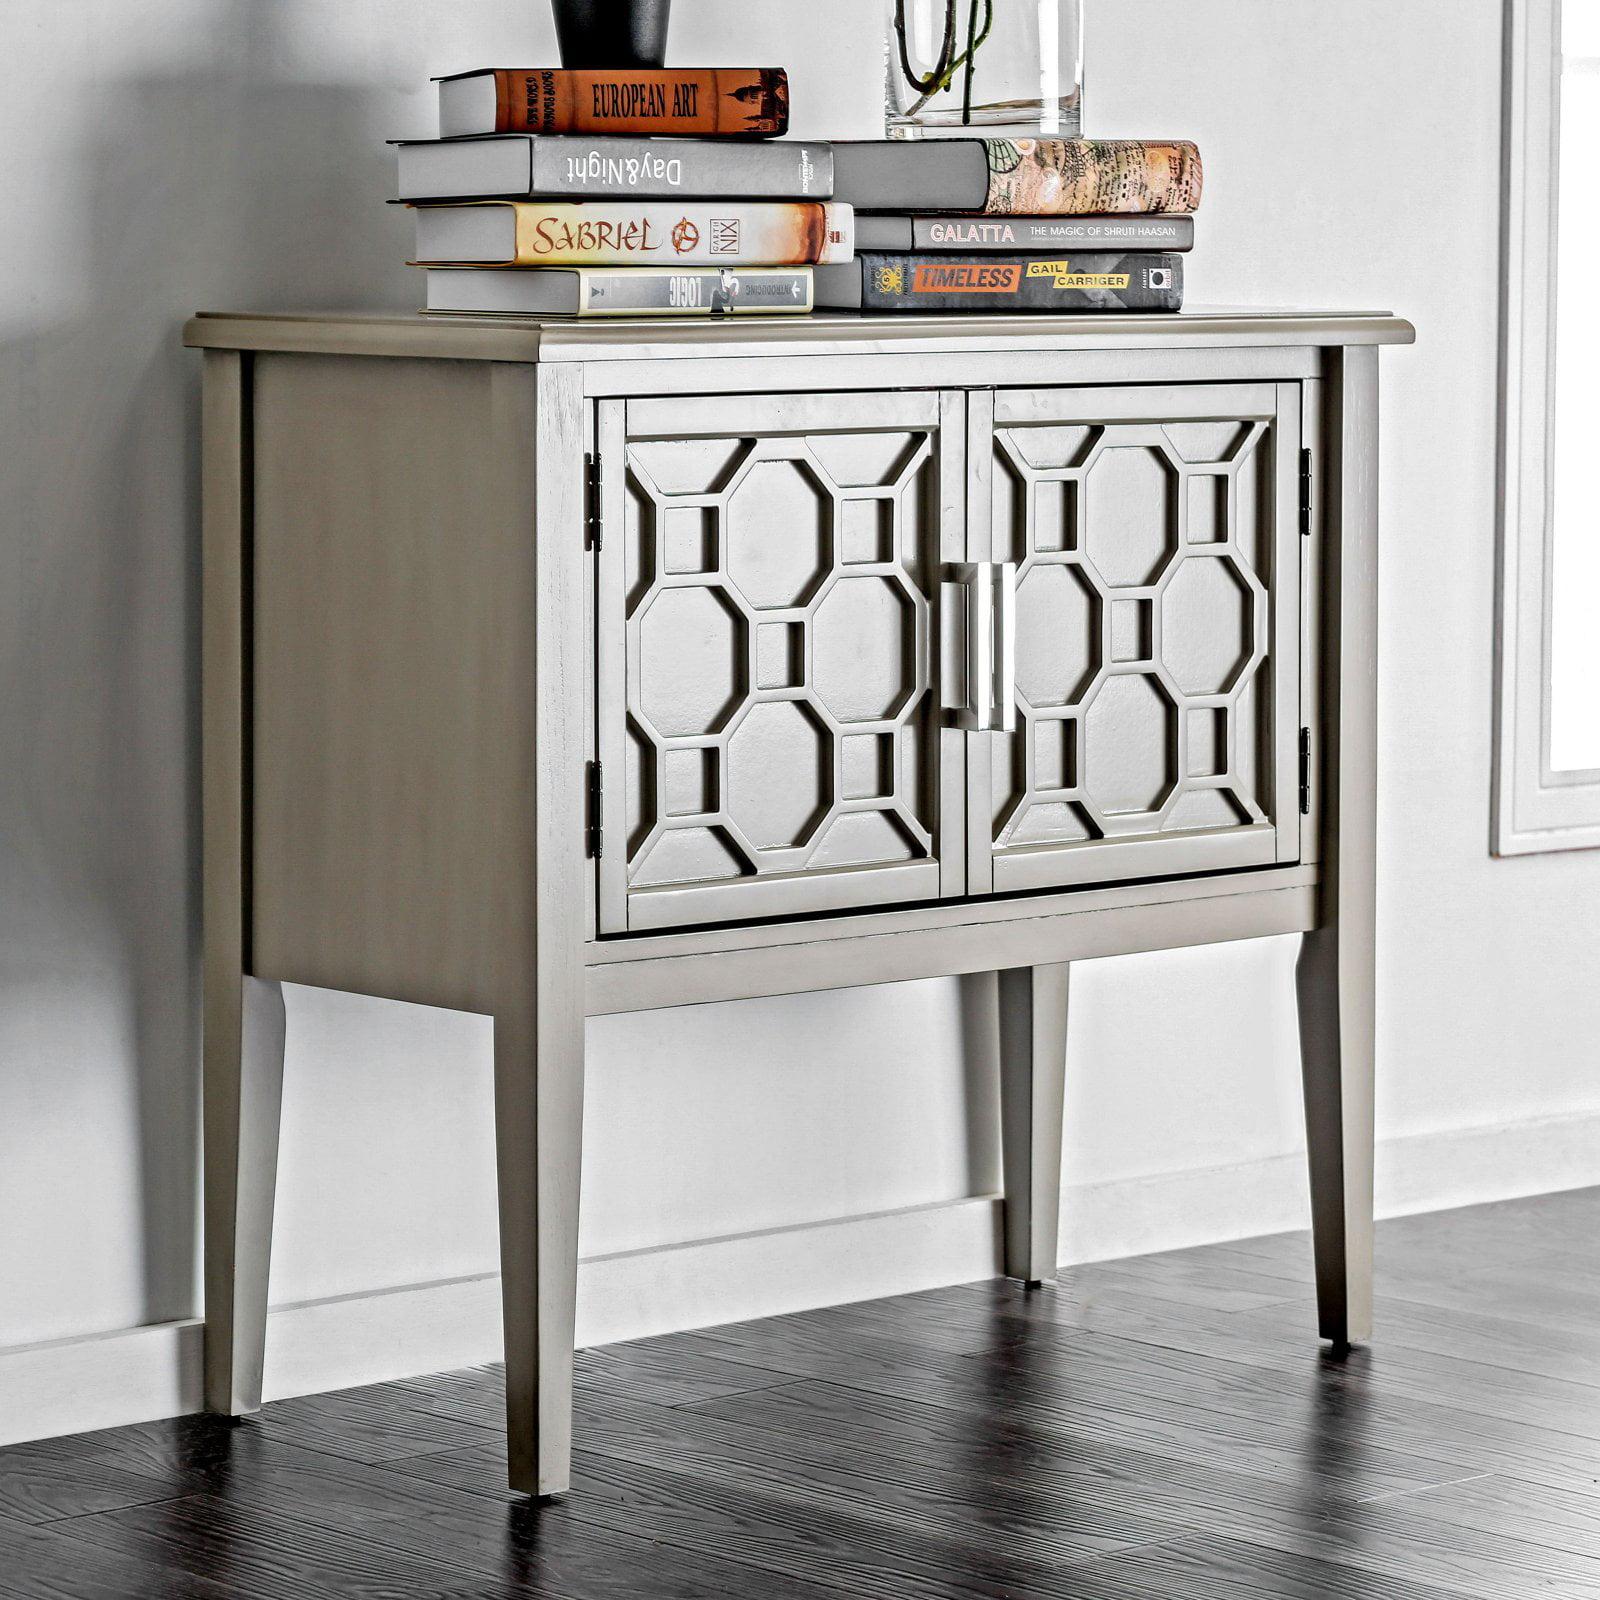 Furniture of America Thalia Contemporary Style Double Door Hallway Cabinet